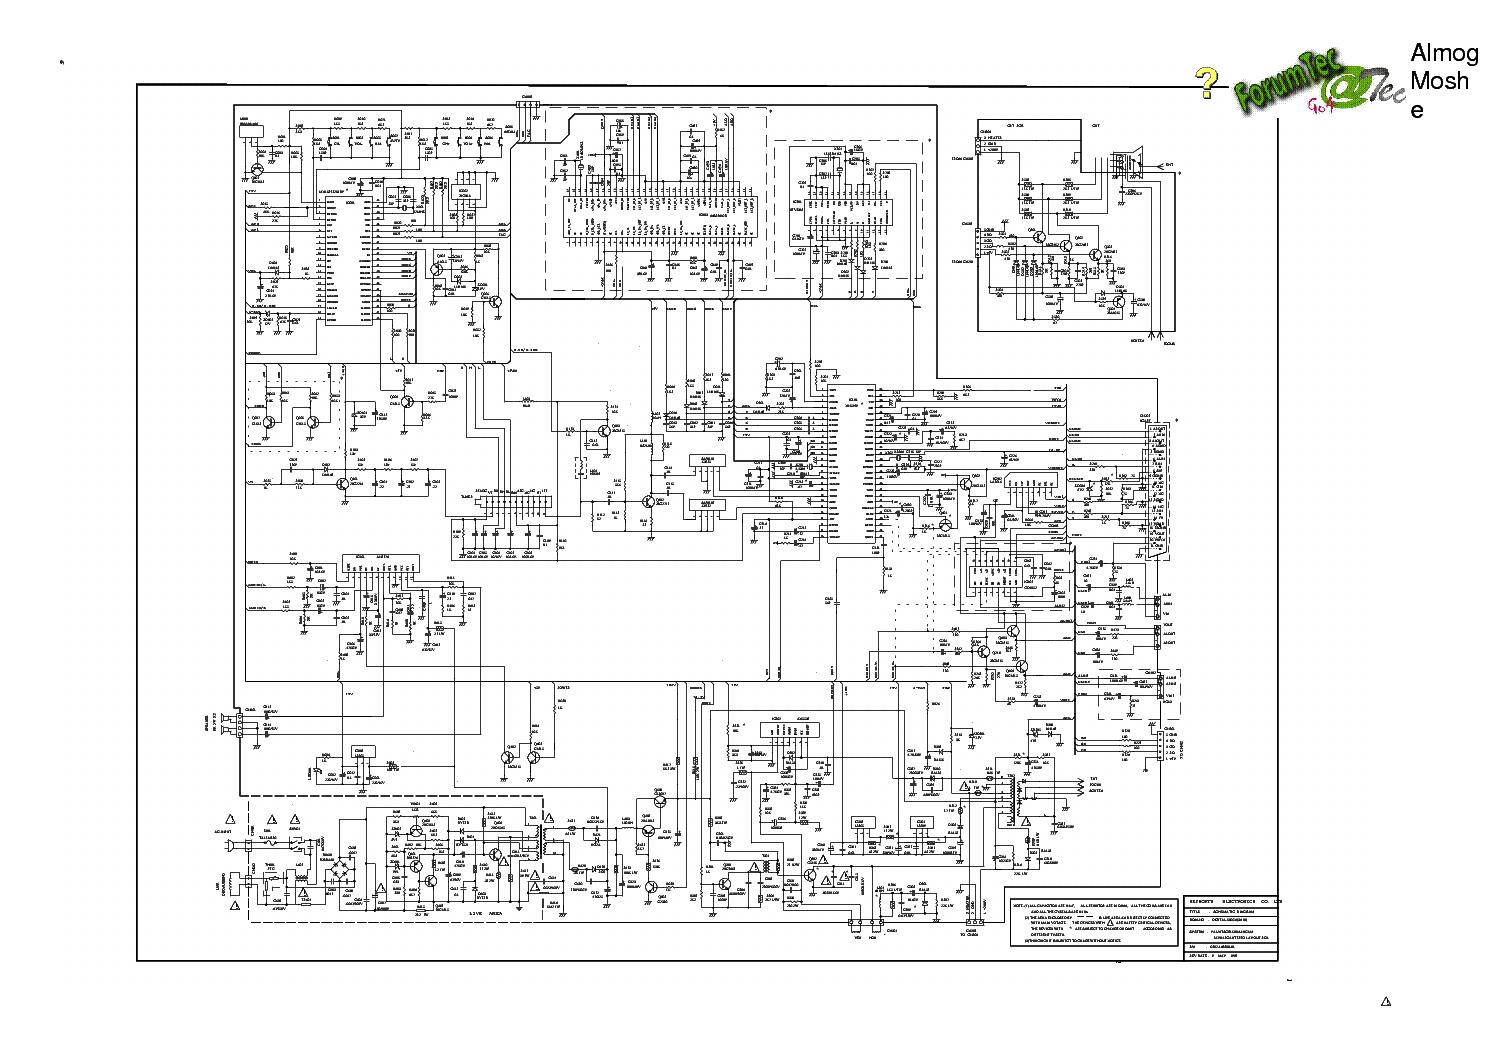 skyworth 3n10 mn18p73284dp nn5199 tv d service manual